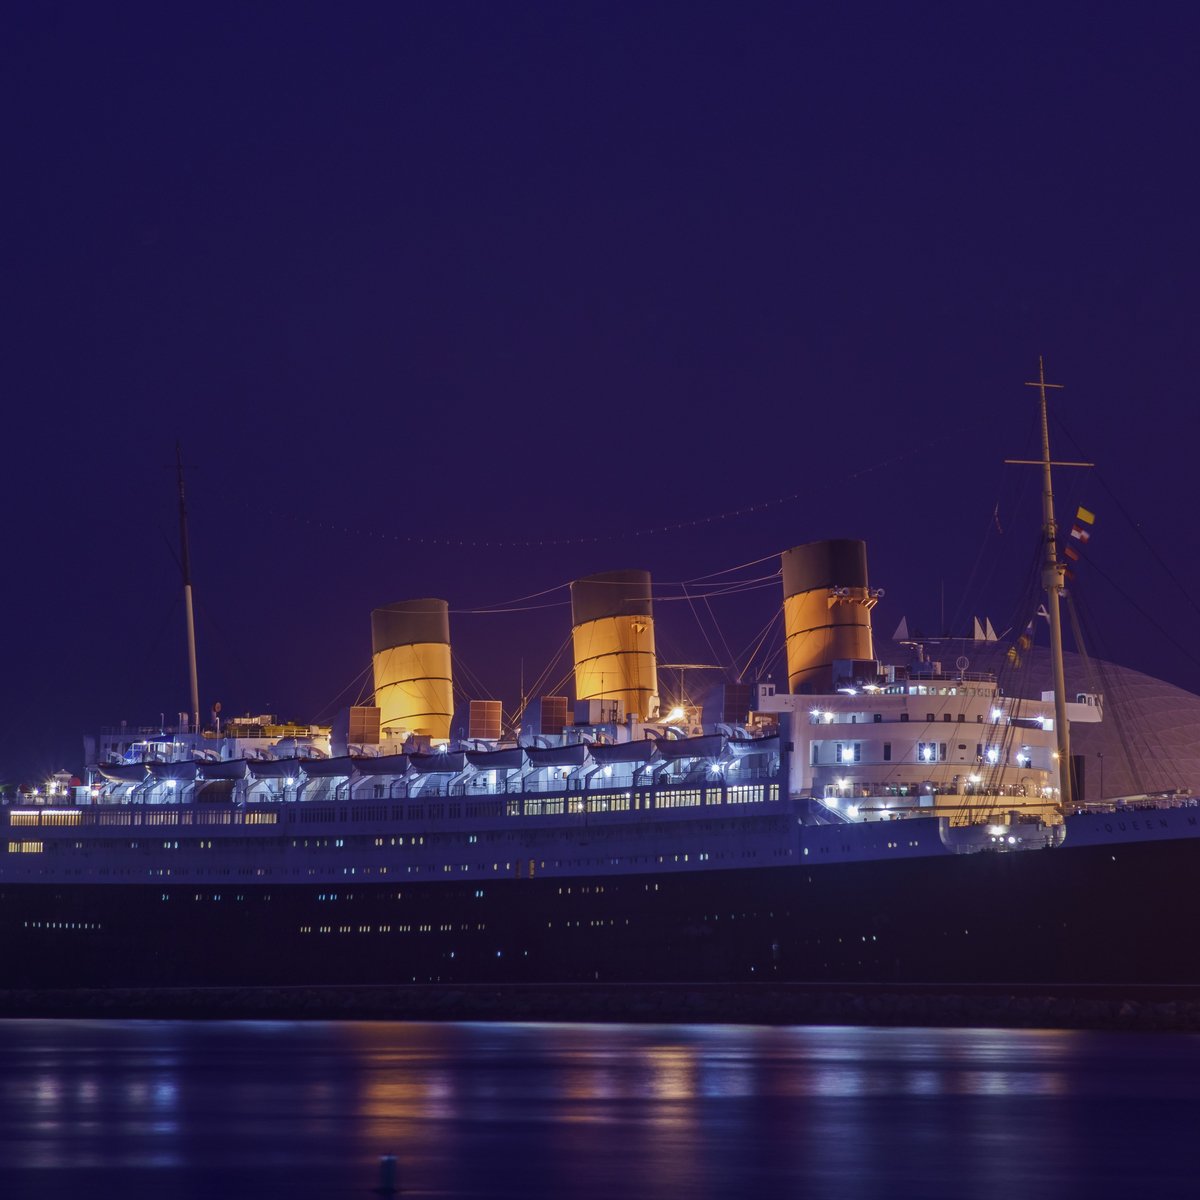 The Queen Mary in Long Beach, California.